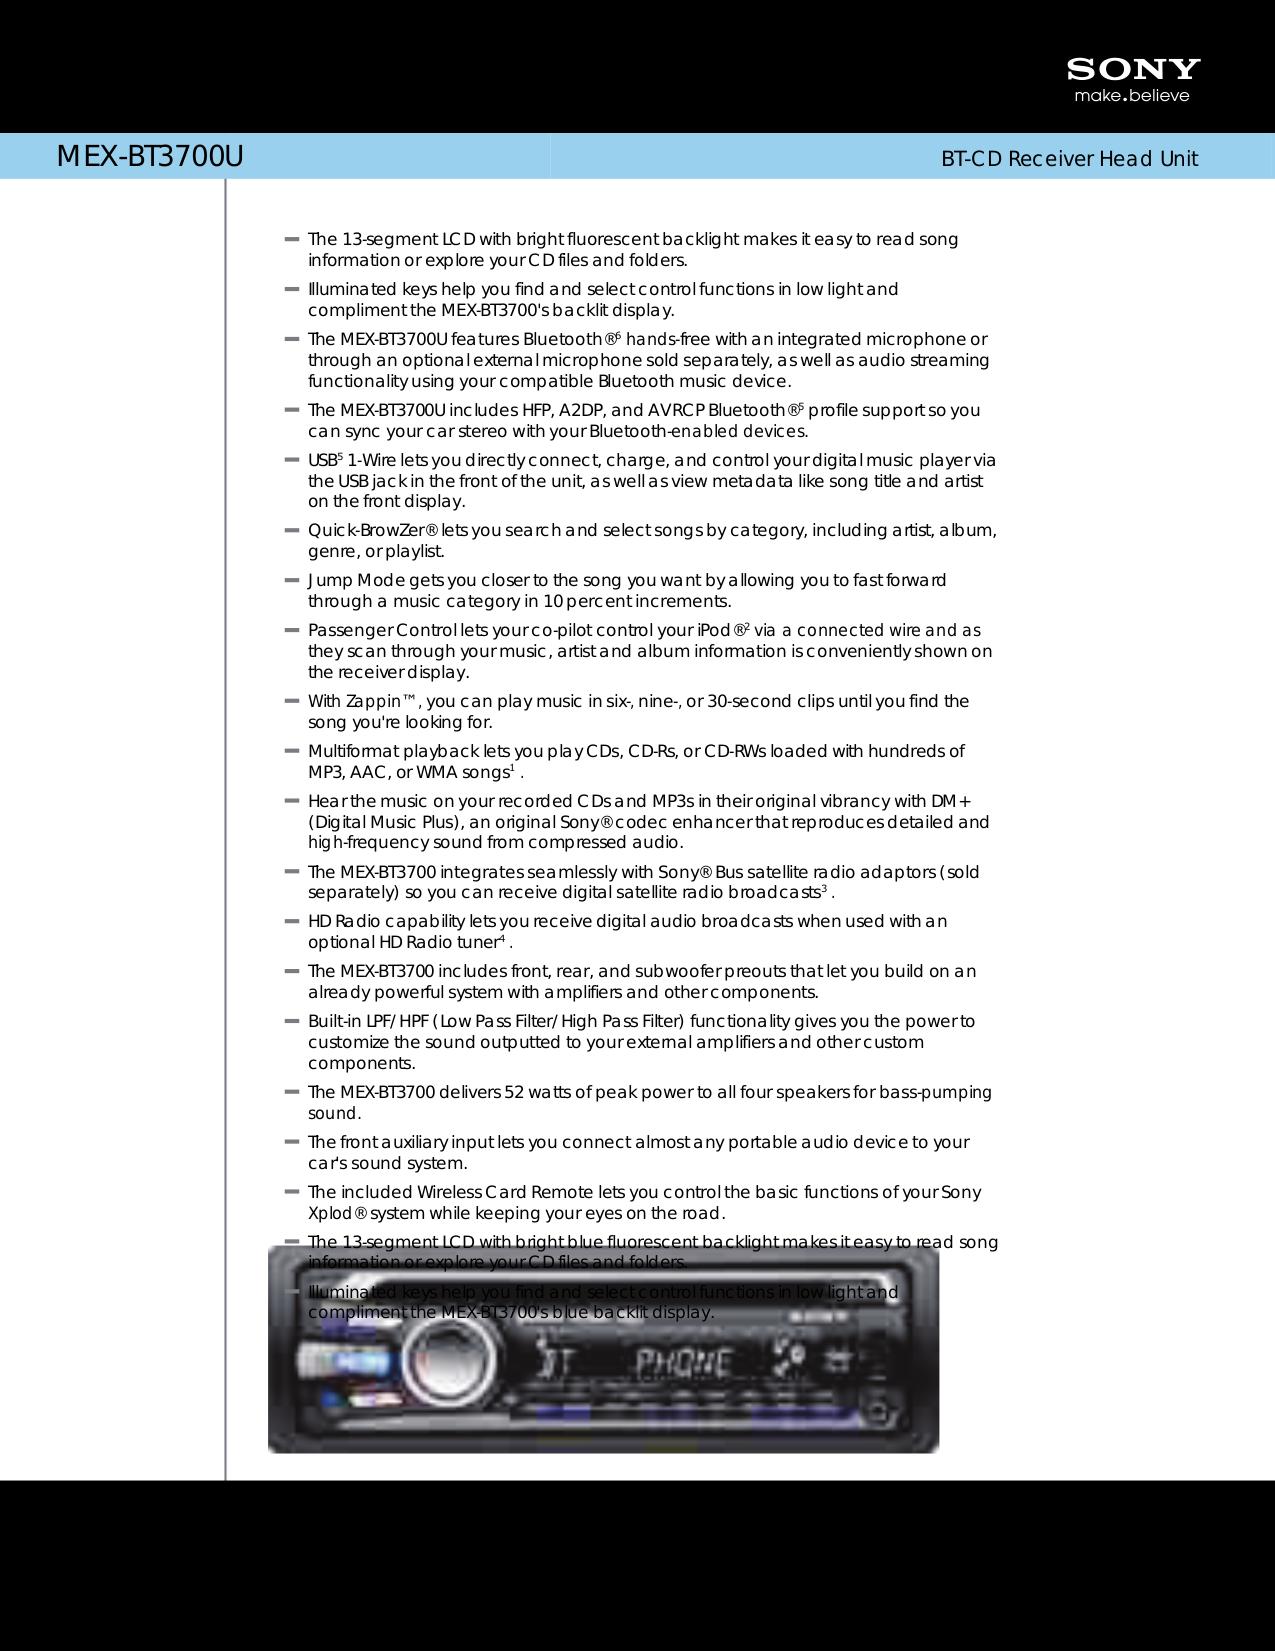 MEXBT3700U_mksp.pdf 0 download free pdf for sony xplod mex bt2700 car receiver manual sony mex bt2700 wiring diagram at gsmx.co